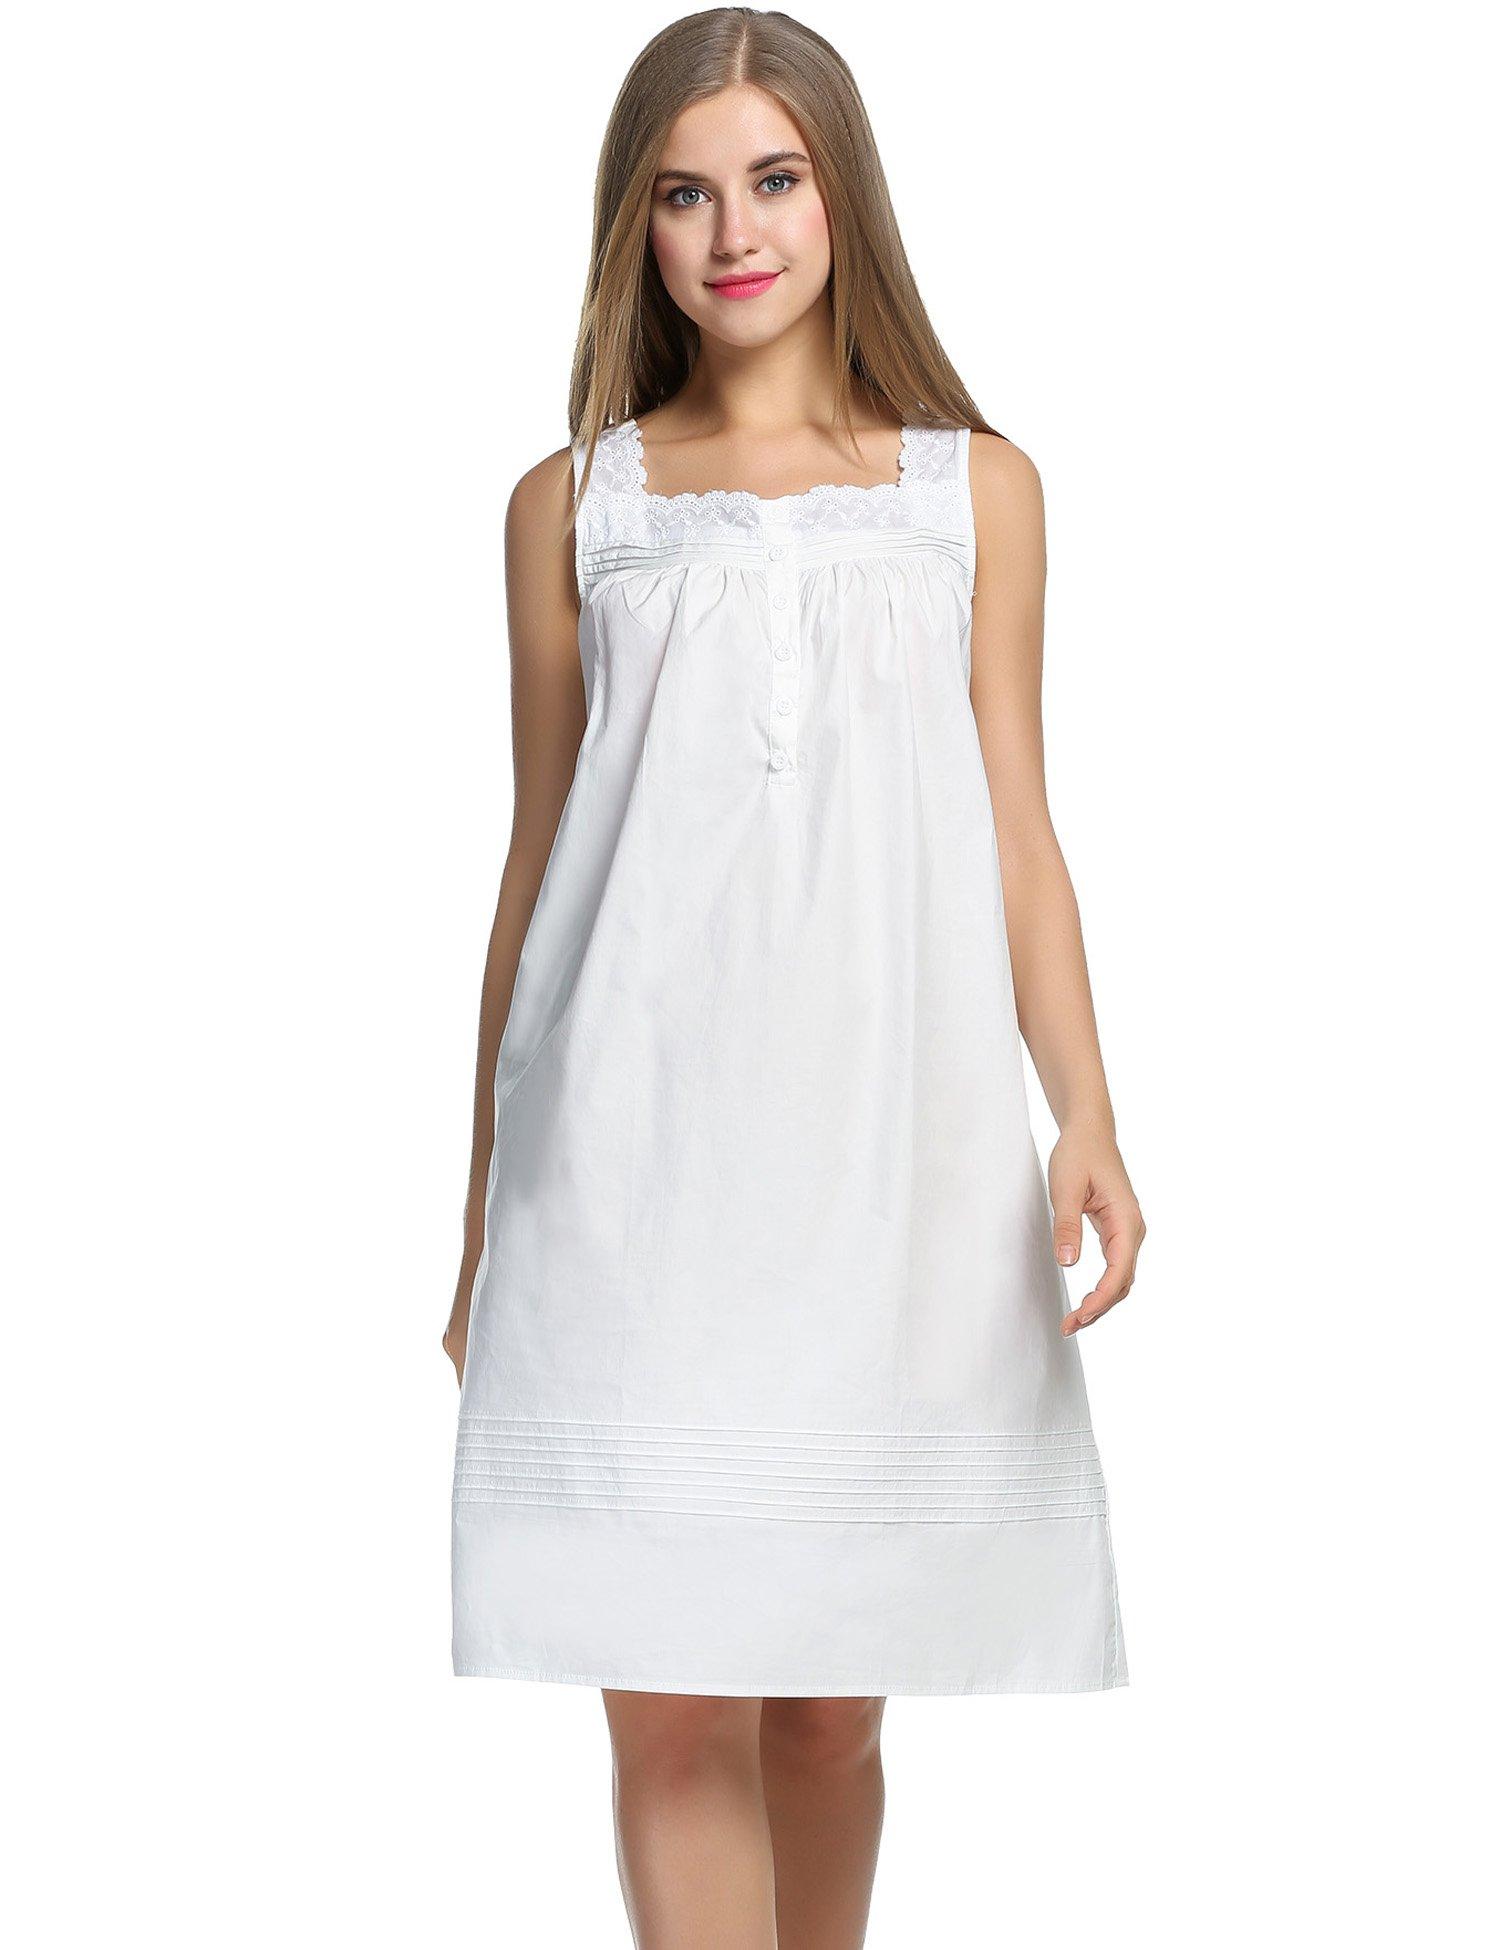 Hotouch Women's Cotton Sleeveless Short Nightgown White XXL